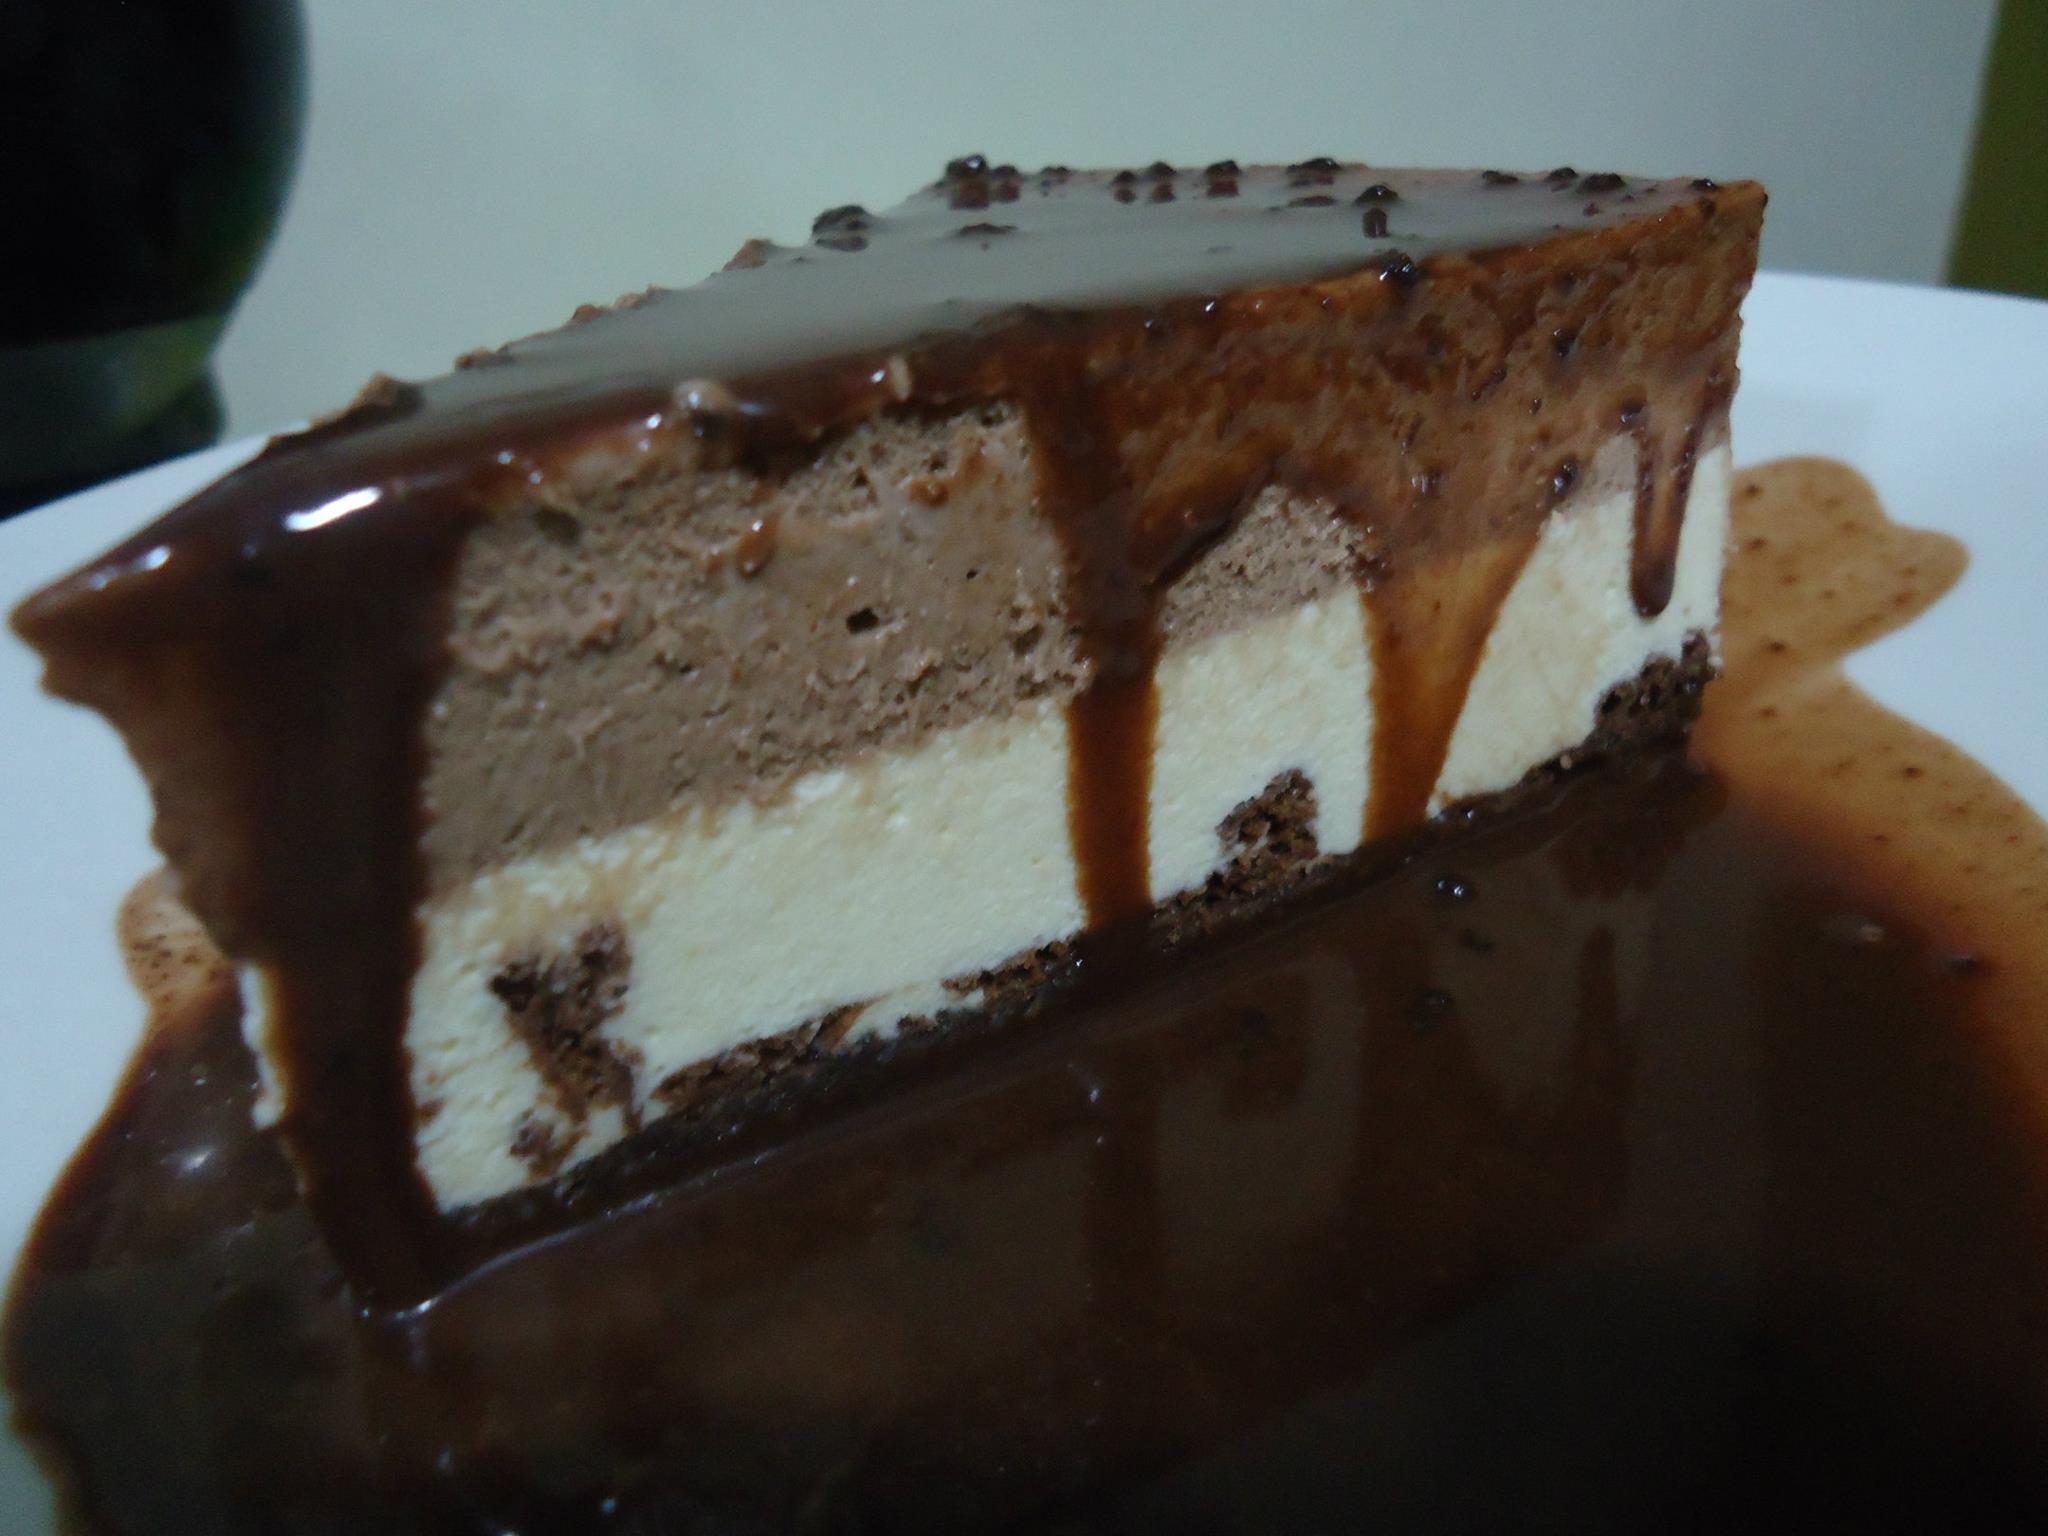 Mousse mixto de chocolate blanco